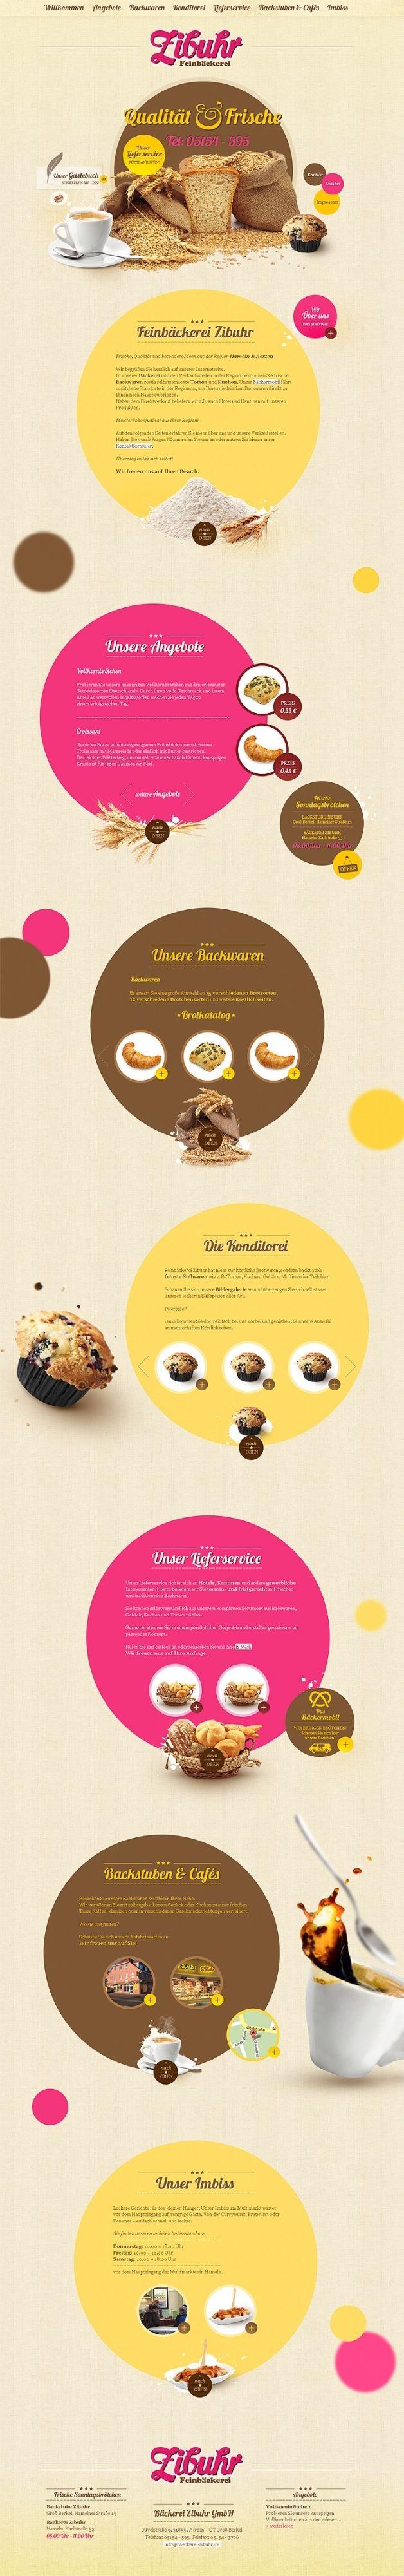 #webdesign #inspiration #bakery #cupcake